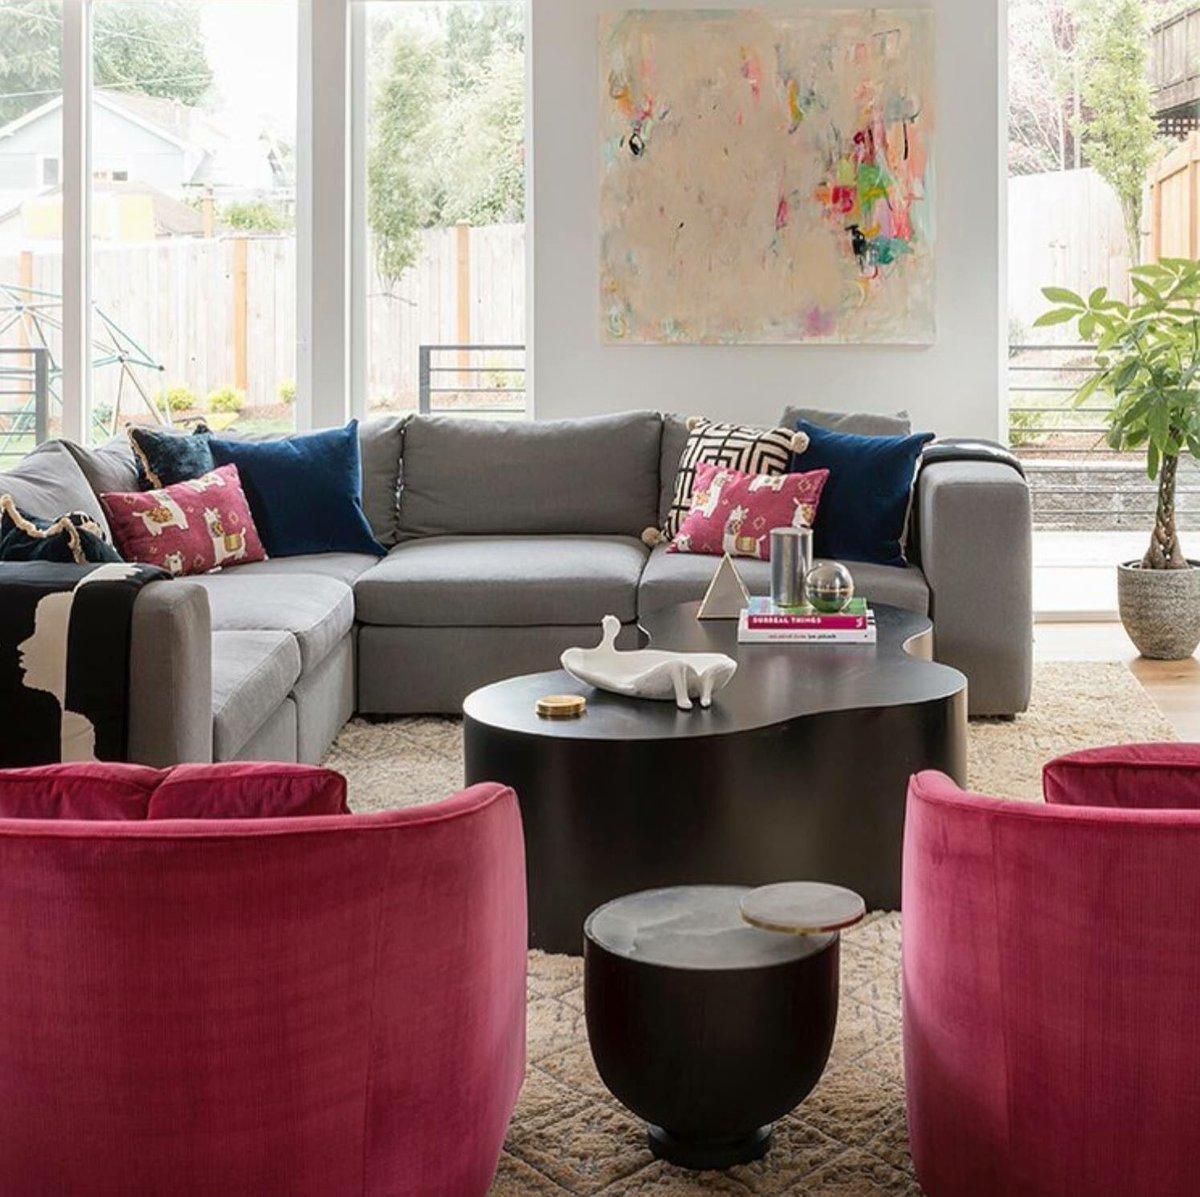 Bernhardt Furniture On Twitter Playful Modern Family Room Interior